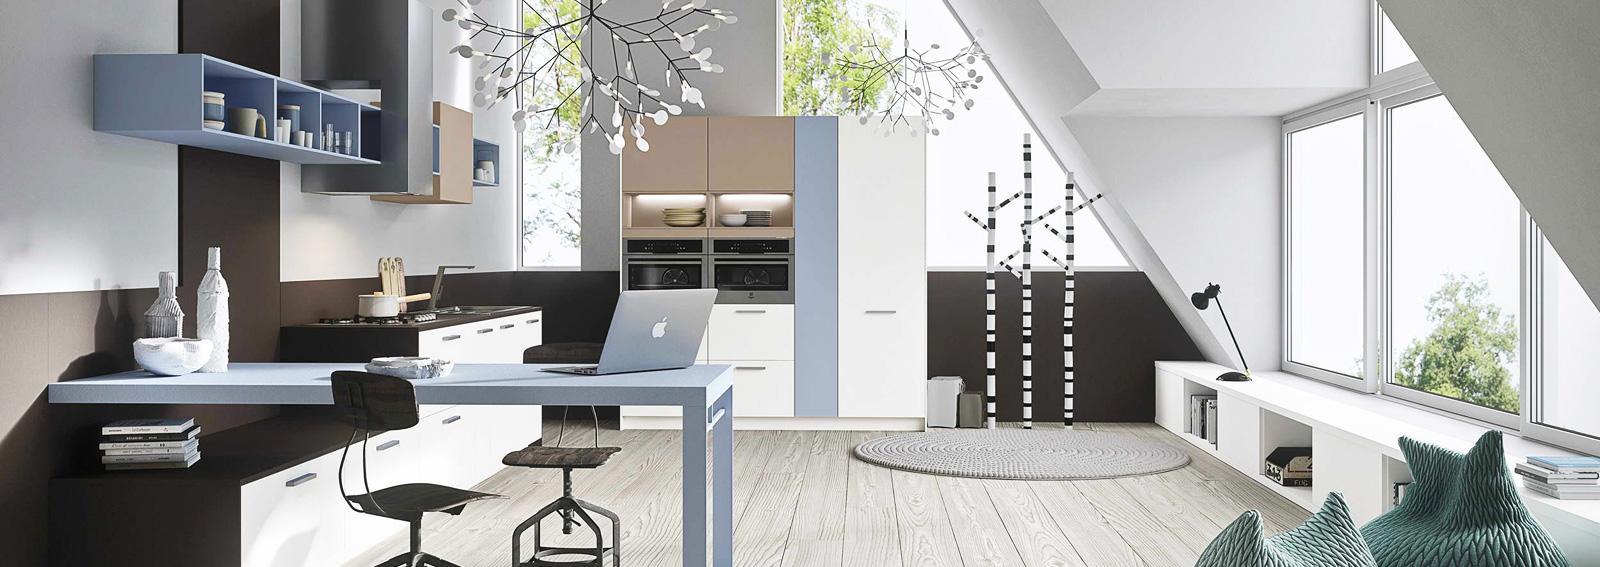 cover-snaidero-cucine-piu-belle-desktop